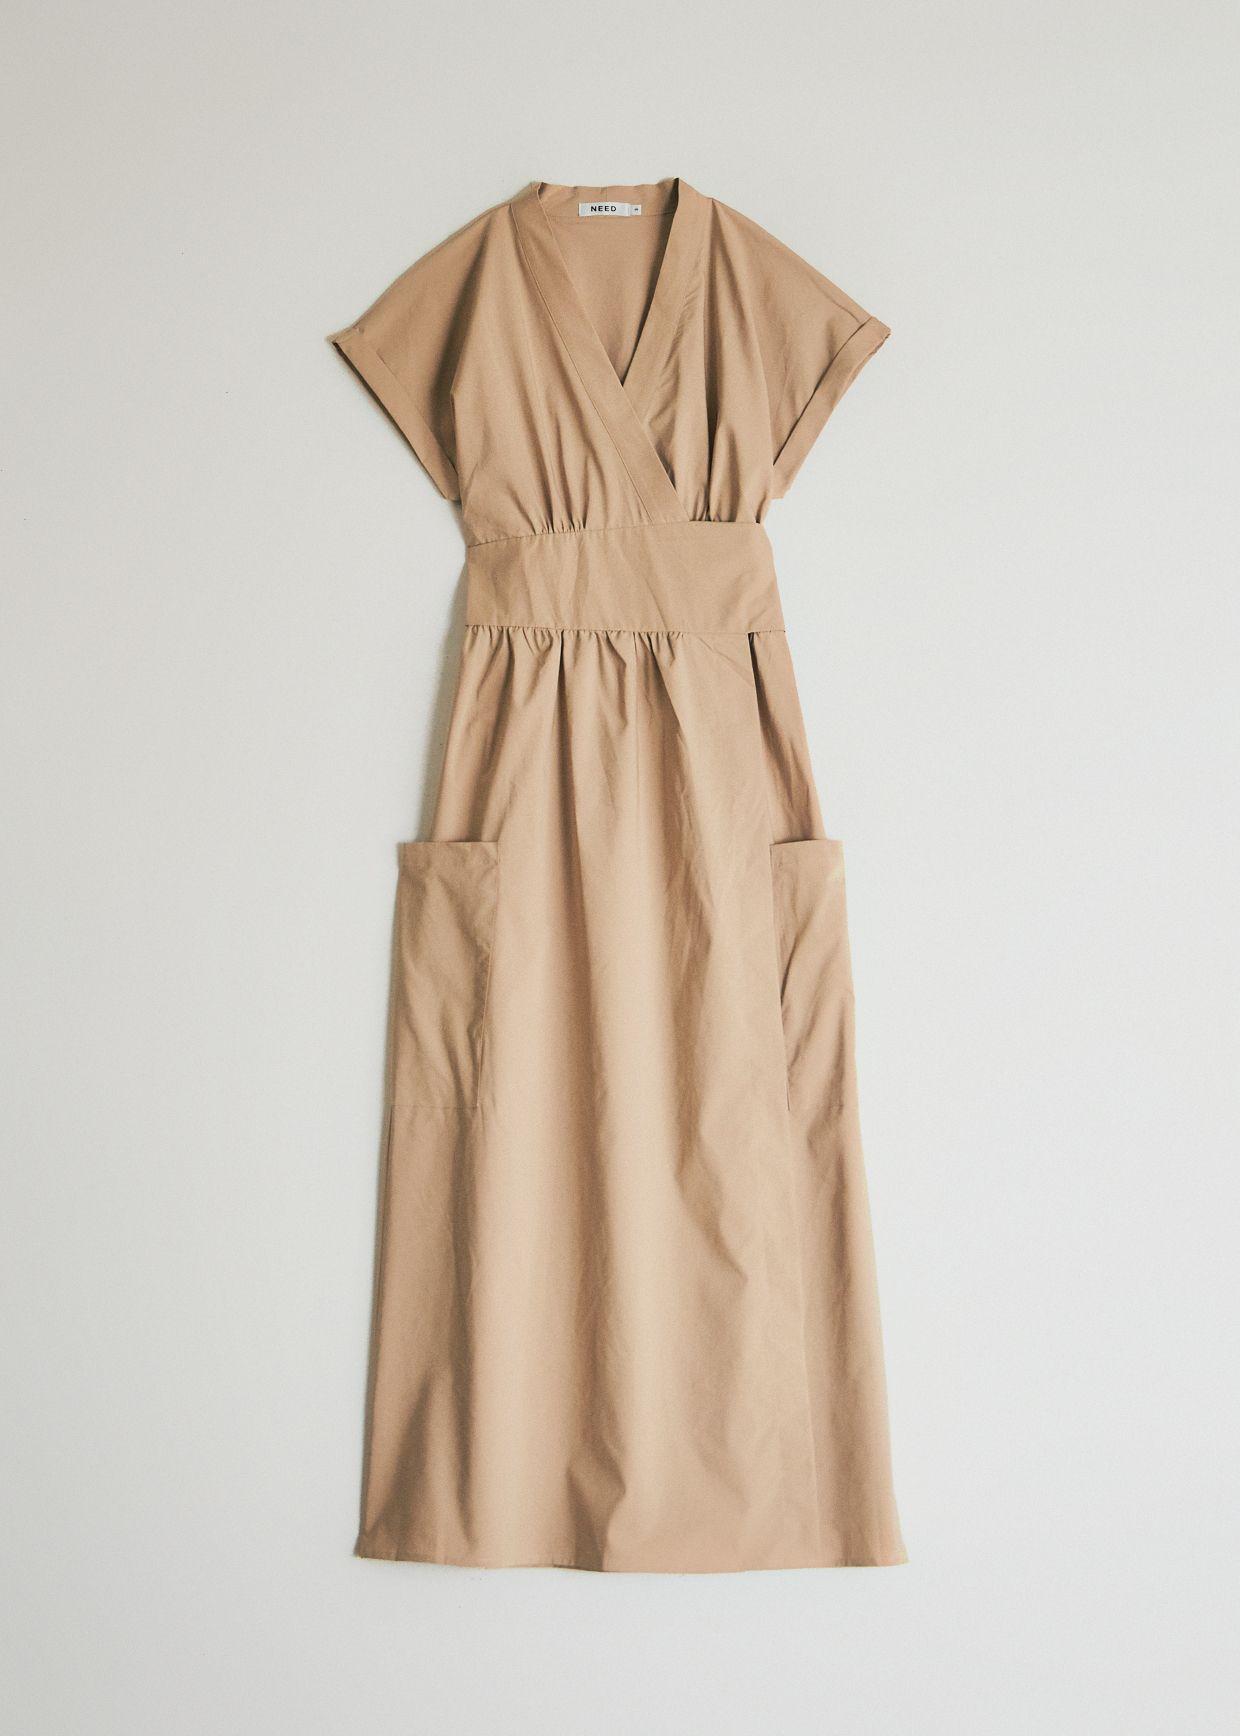 Need Garcia Wrap Dress In Tan Wrap Dress Dresses Clothes Design [ 1736 x 1240 Pixel ]